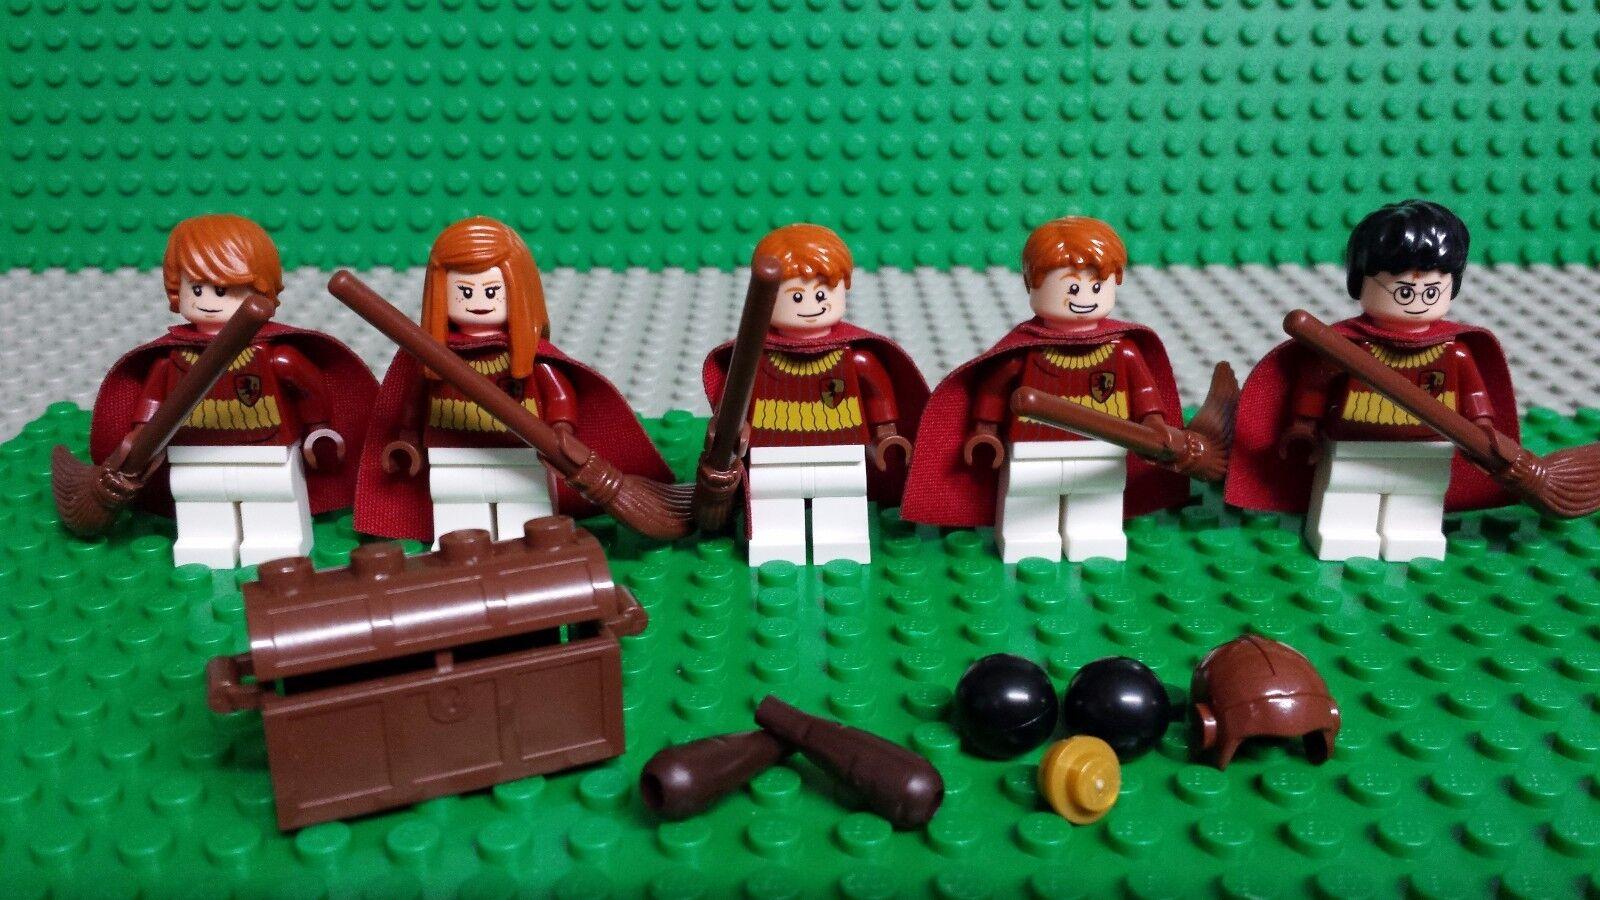 LEGO HARRY POTTER 4737 QUIDDITCH MATCH Gryffindor MINIFIGURES Genuine Lego